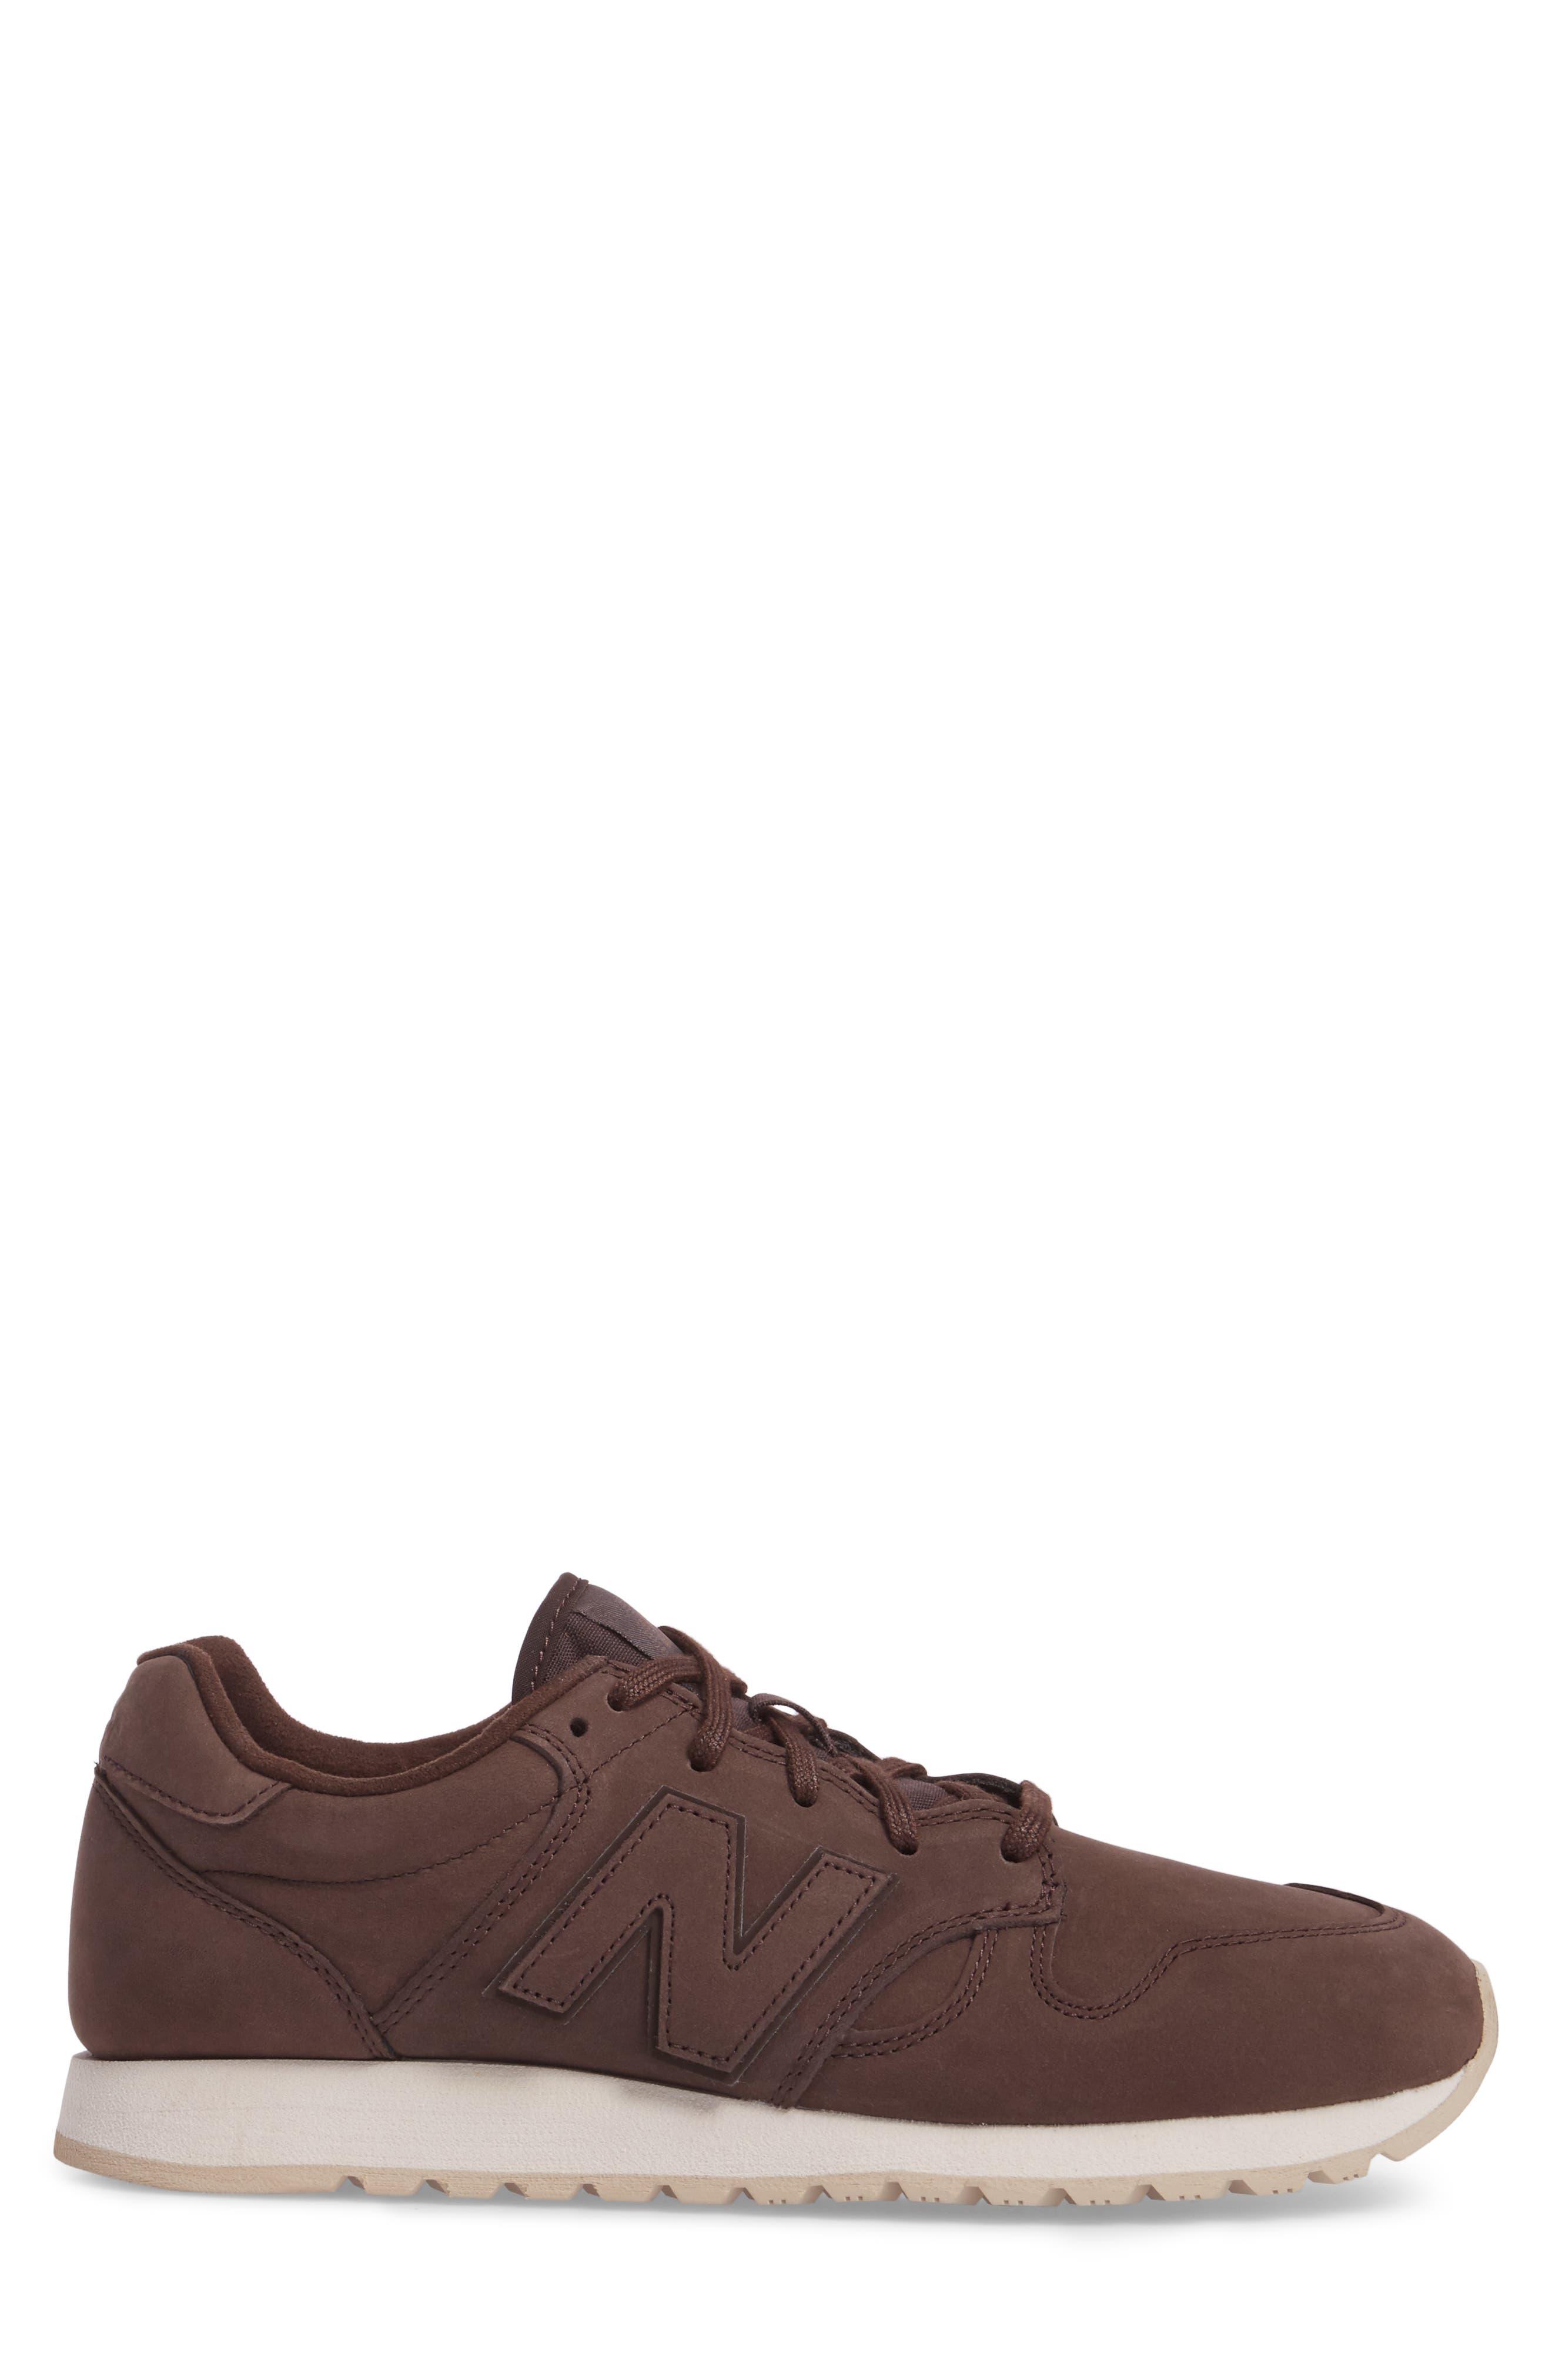 U520 Trainer Sneaker,                             Alternate thumbnail 5, color,